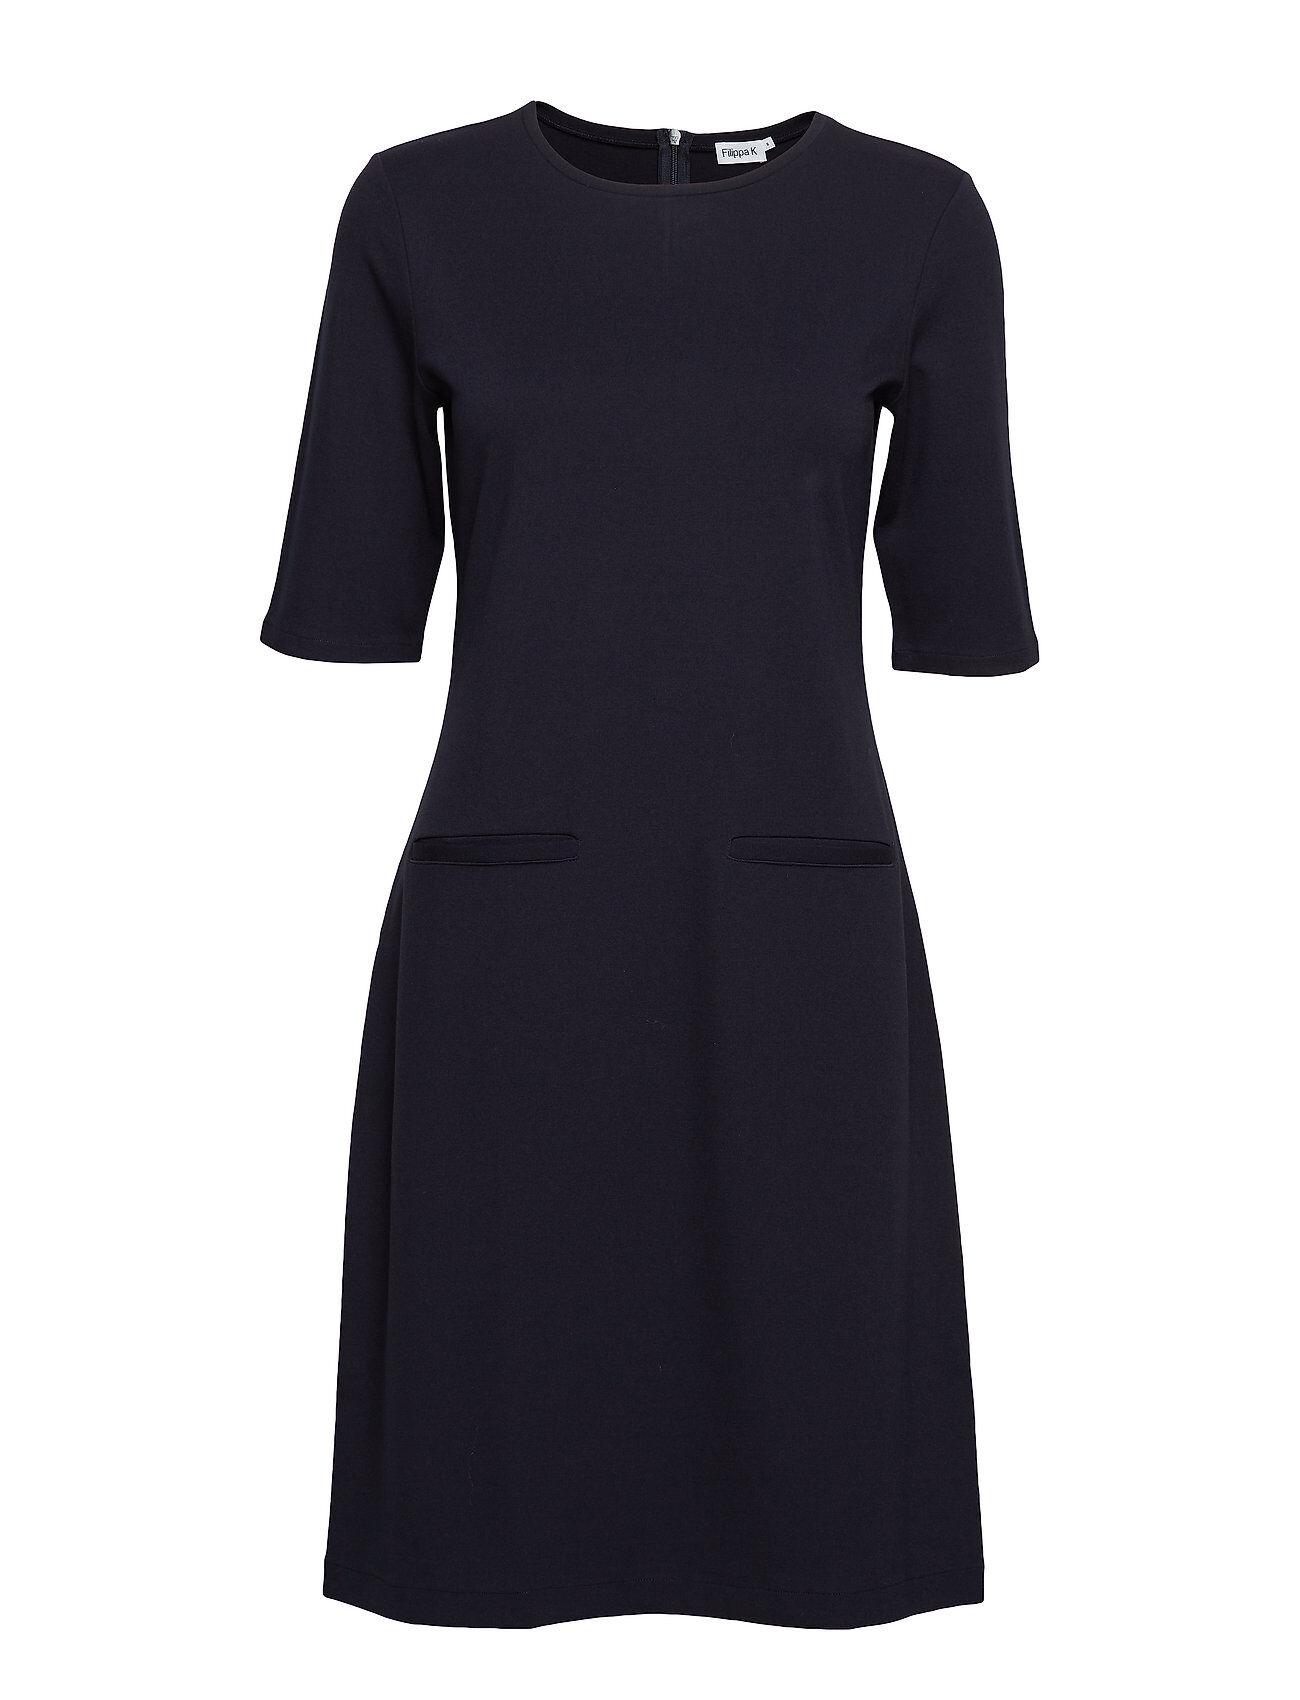 Filippa K Front Pocket Shift Dress